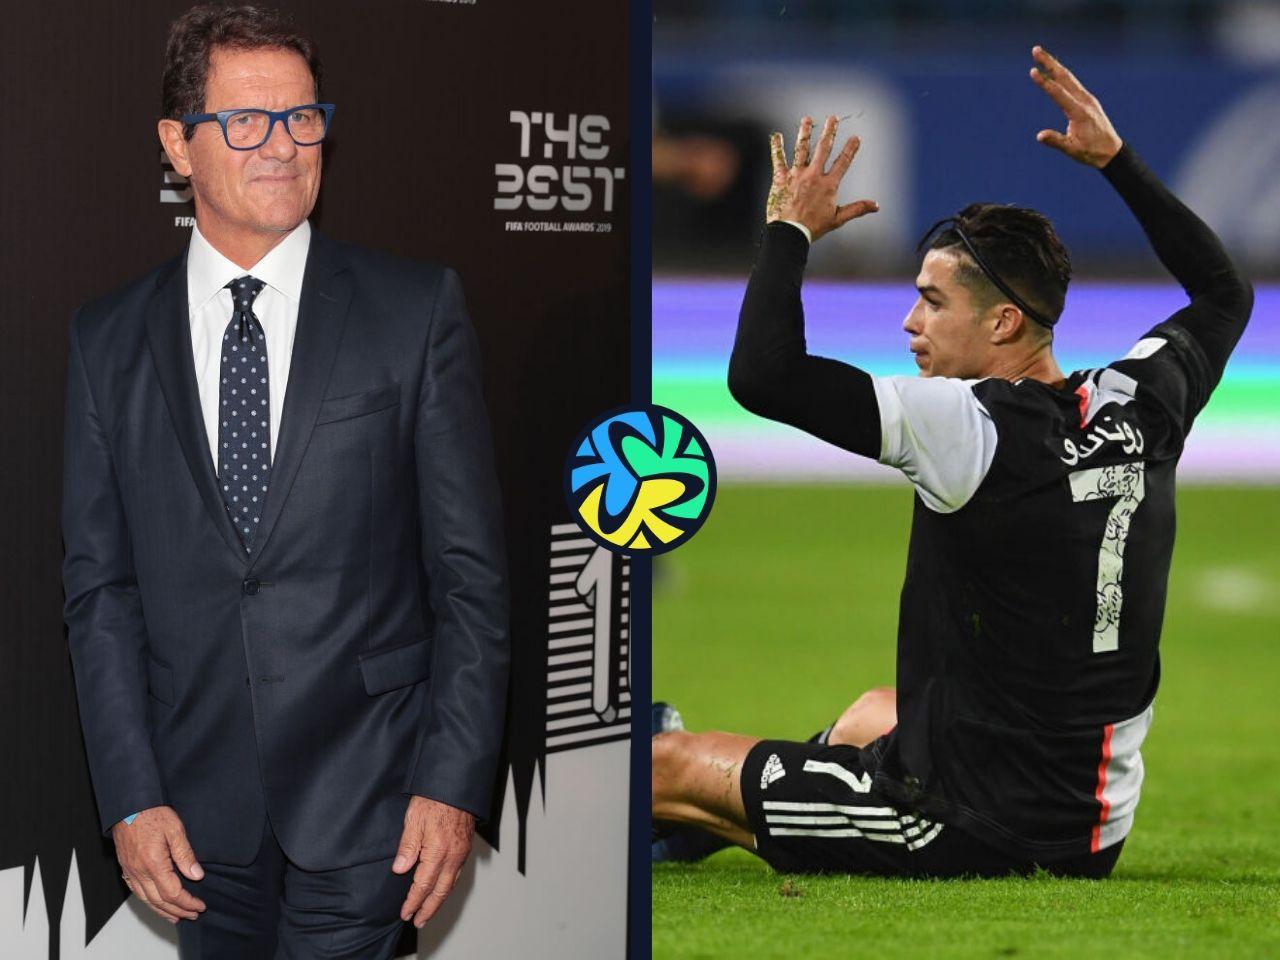 Fabio Capello, Cristiano Ronaldo, Juventus, Serie A